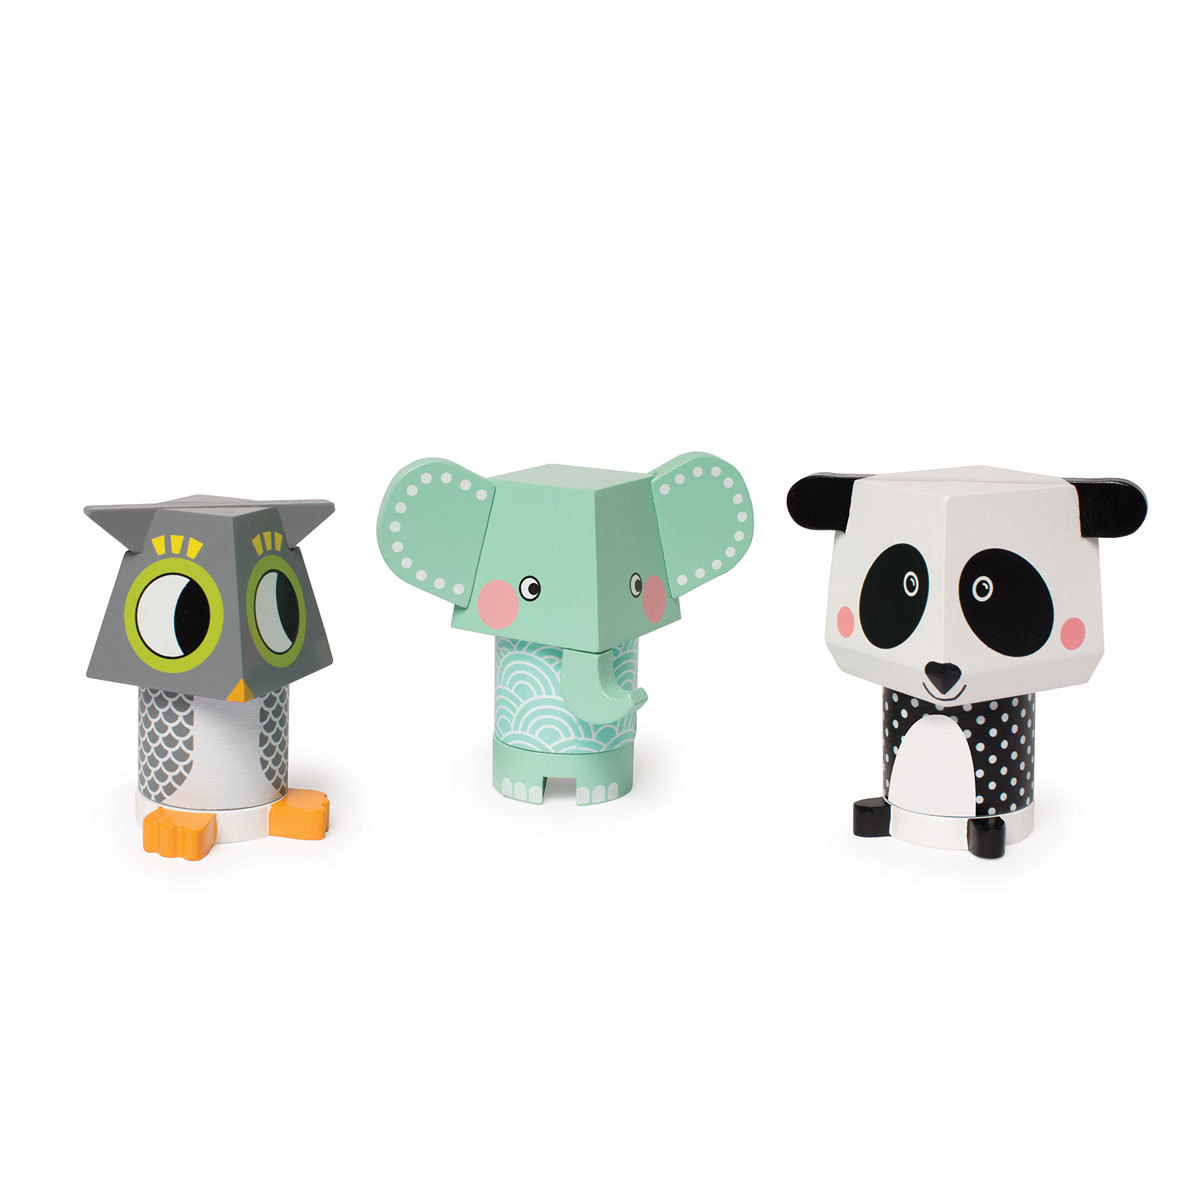 Mes premiers jouets Mix & Match - Panda, Chouette et Elephant Mix & Match - Panda, Chouette et Elephant